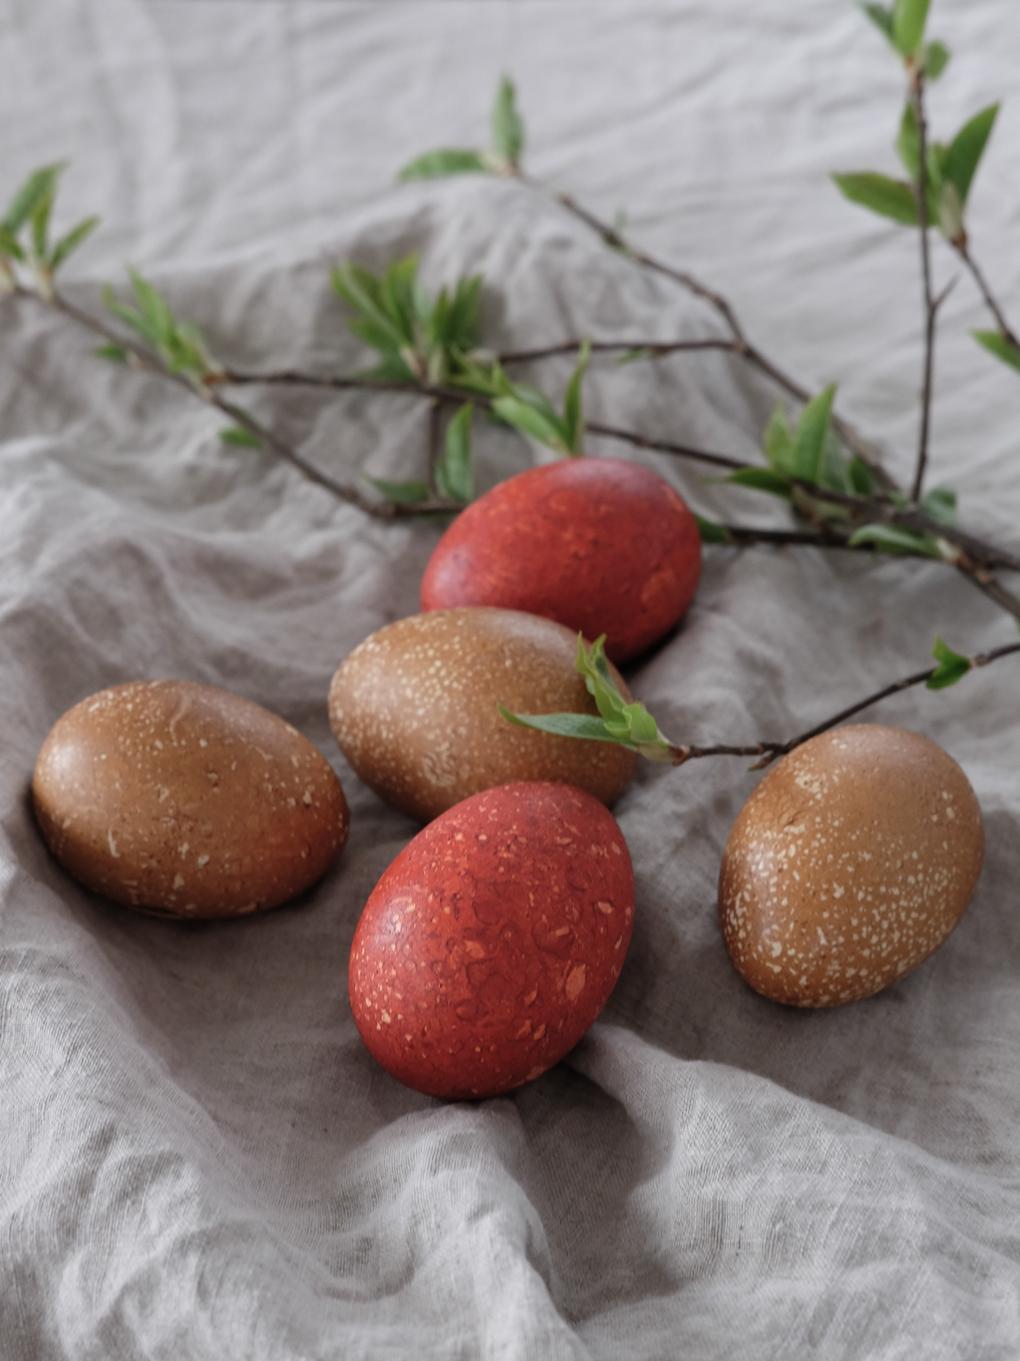 Naturally-dyed-Easter-eggs.jpg